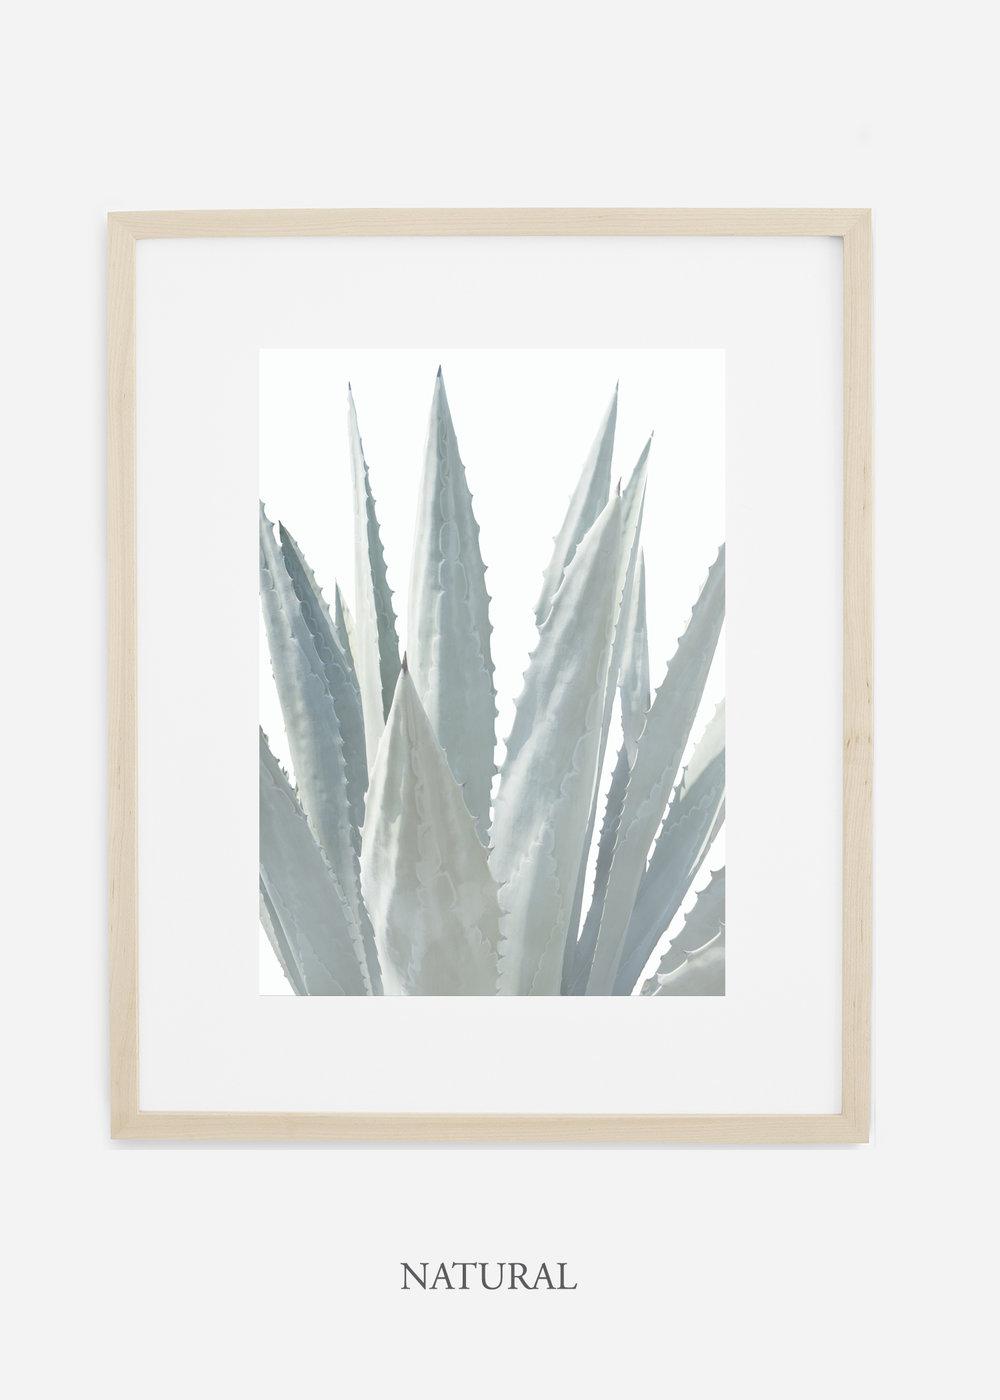 winterwhite_naturalframe_WinterWhiteAgaveNo.3_agave_prints_interiordesign_art_homedecor_bohemian_modern_minimal_photography_cactusphotography.jpg